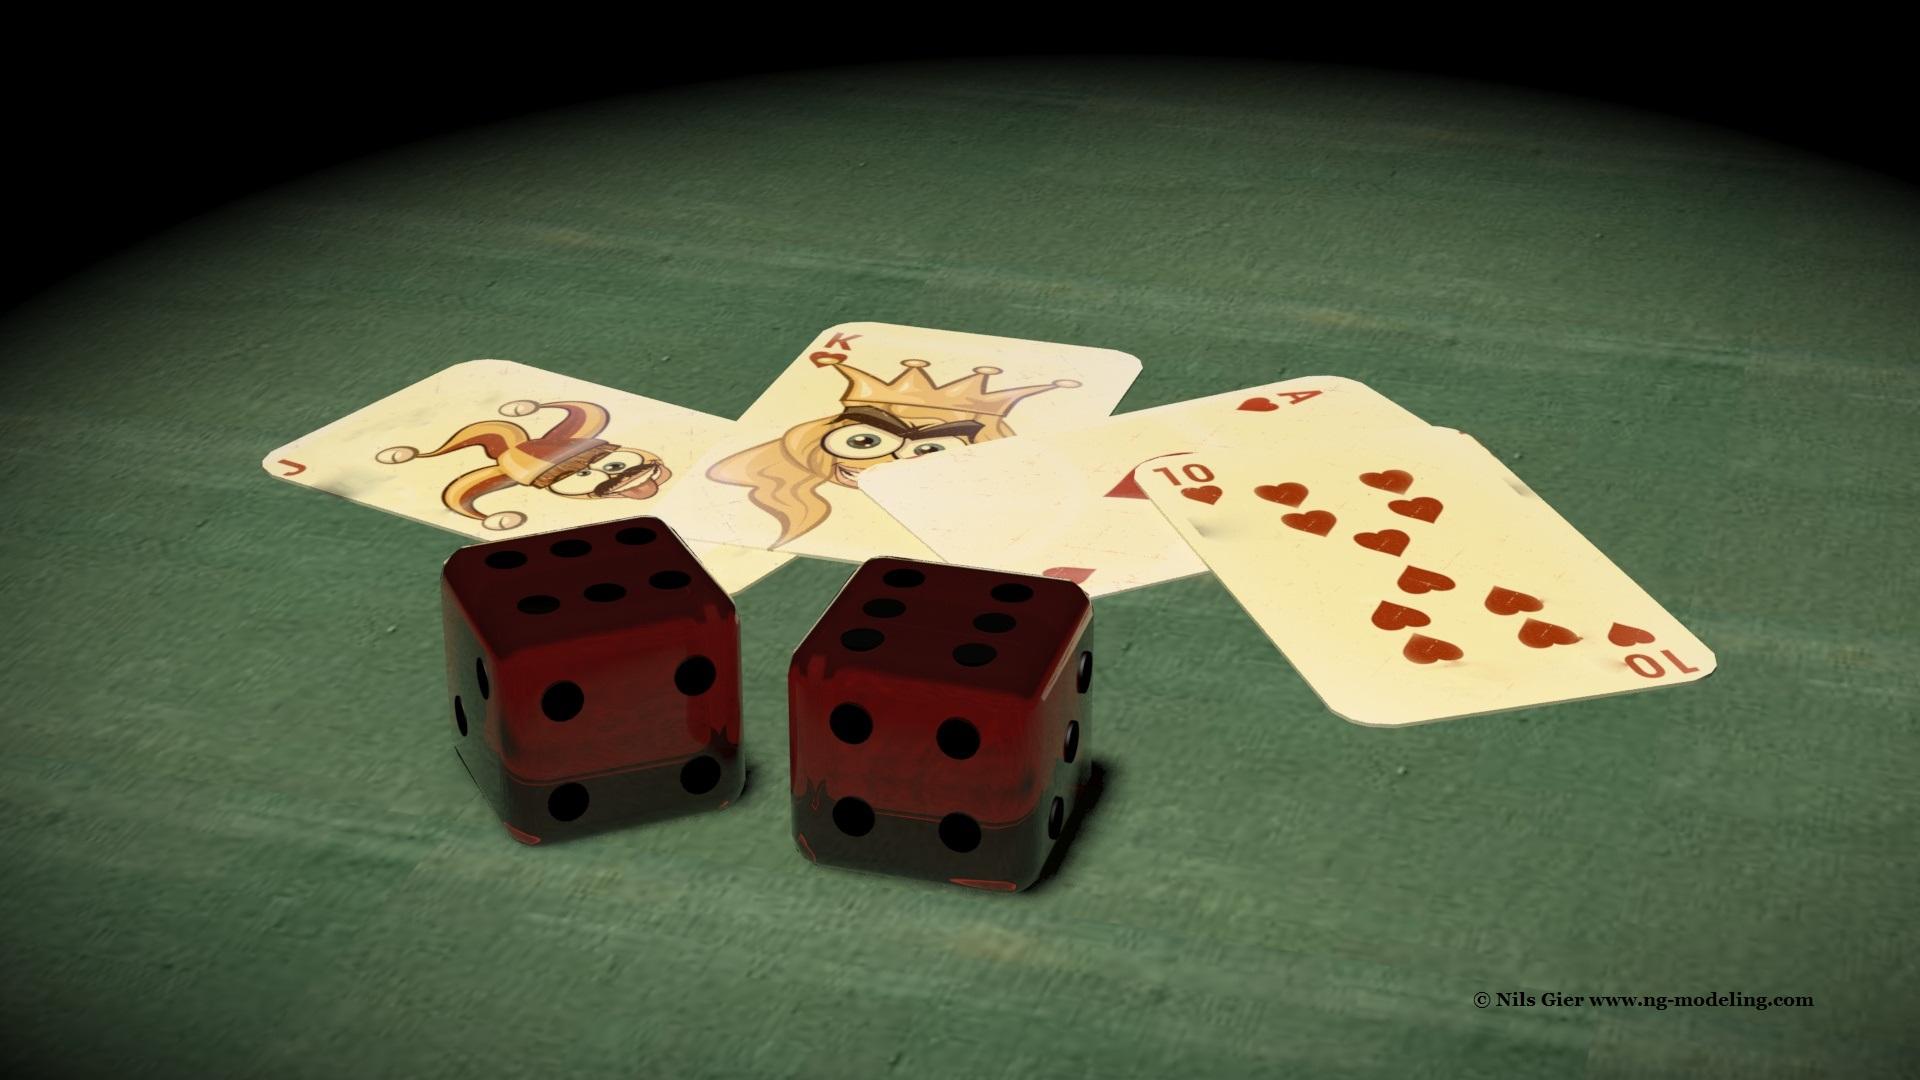 Playcards